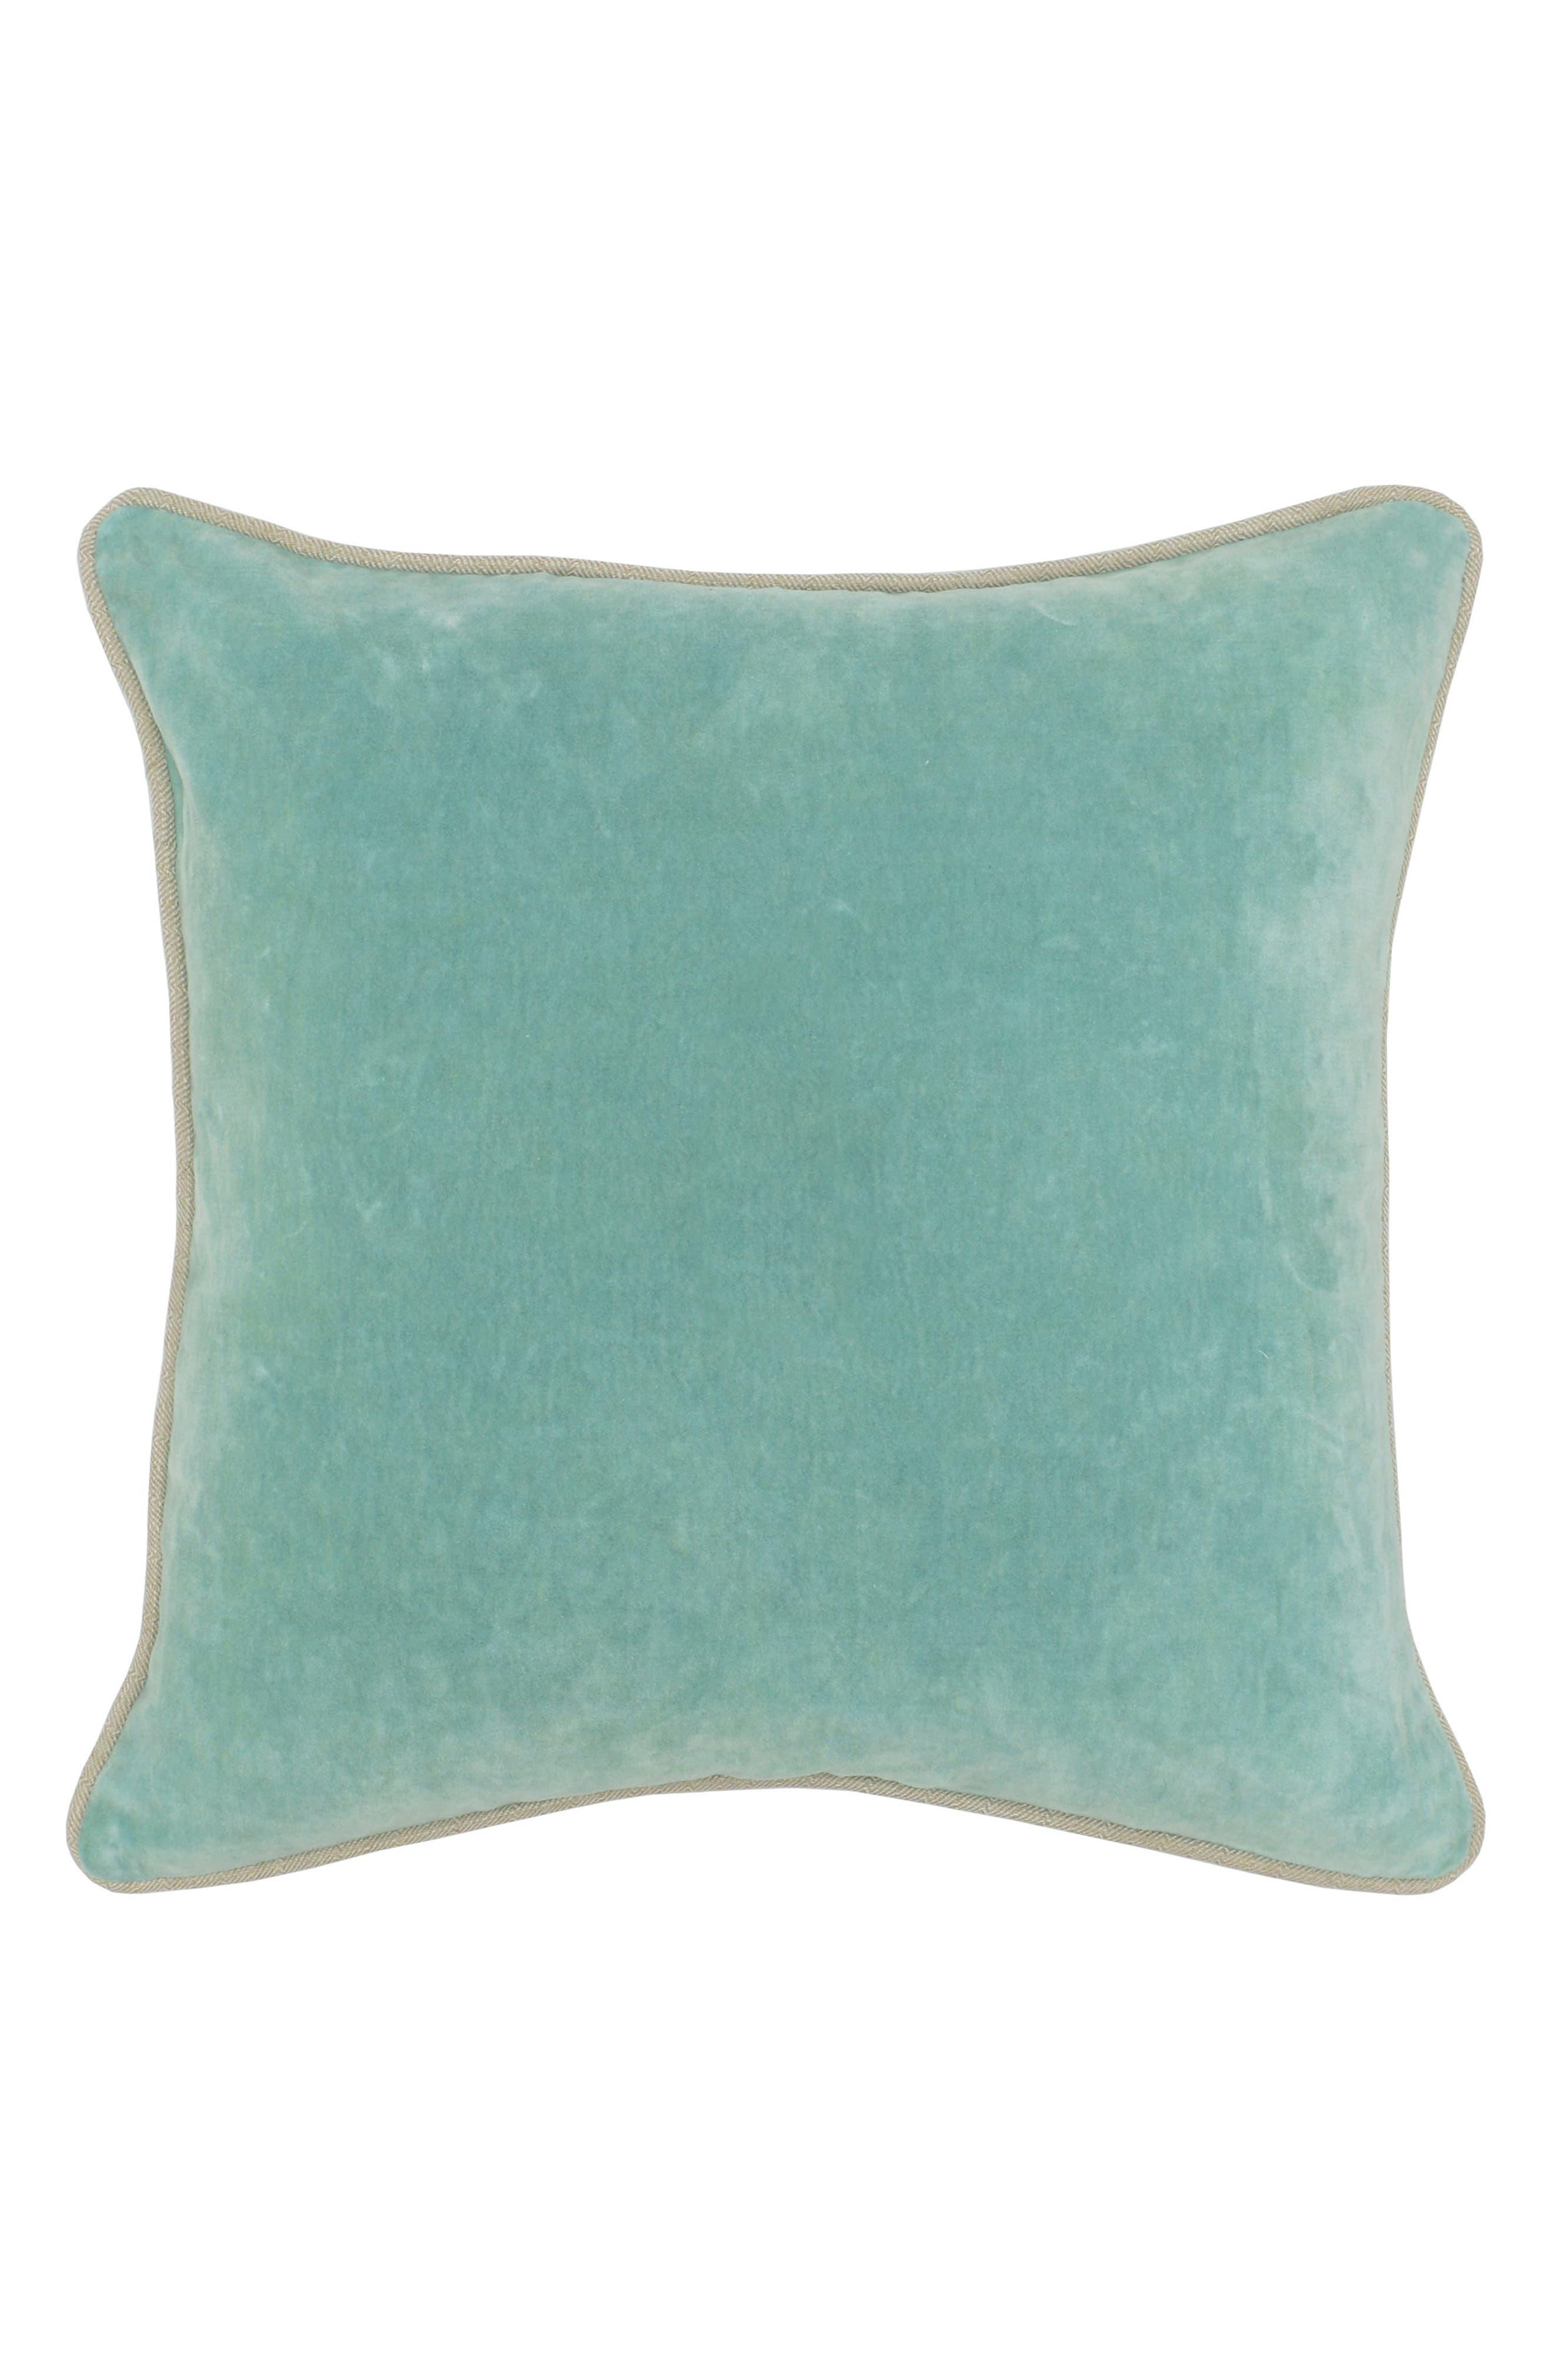 Villa Home Collection Heirloom Velvet Accent Pillow